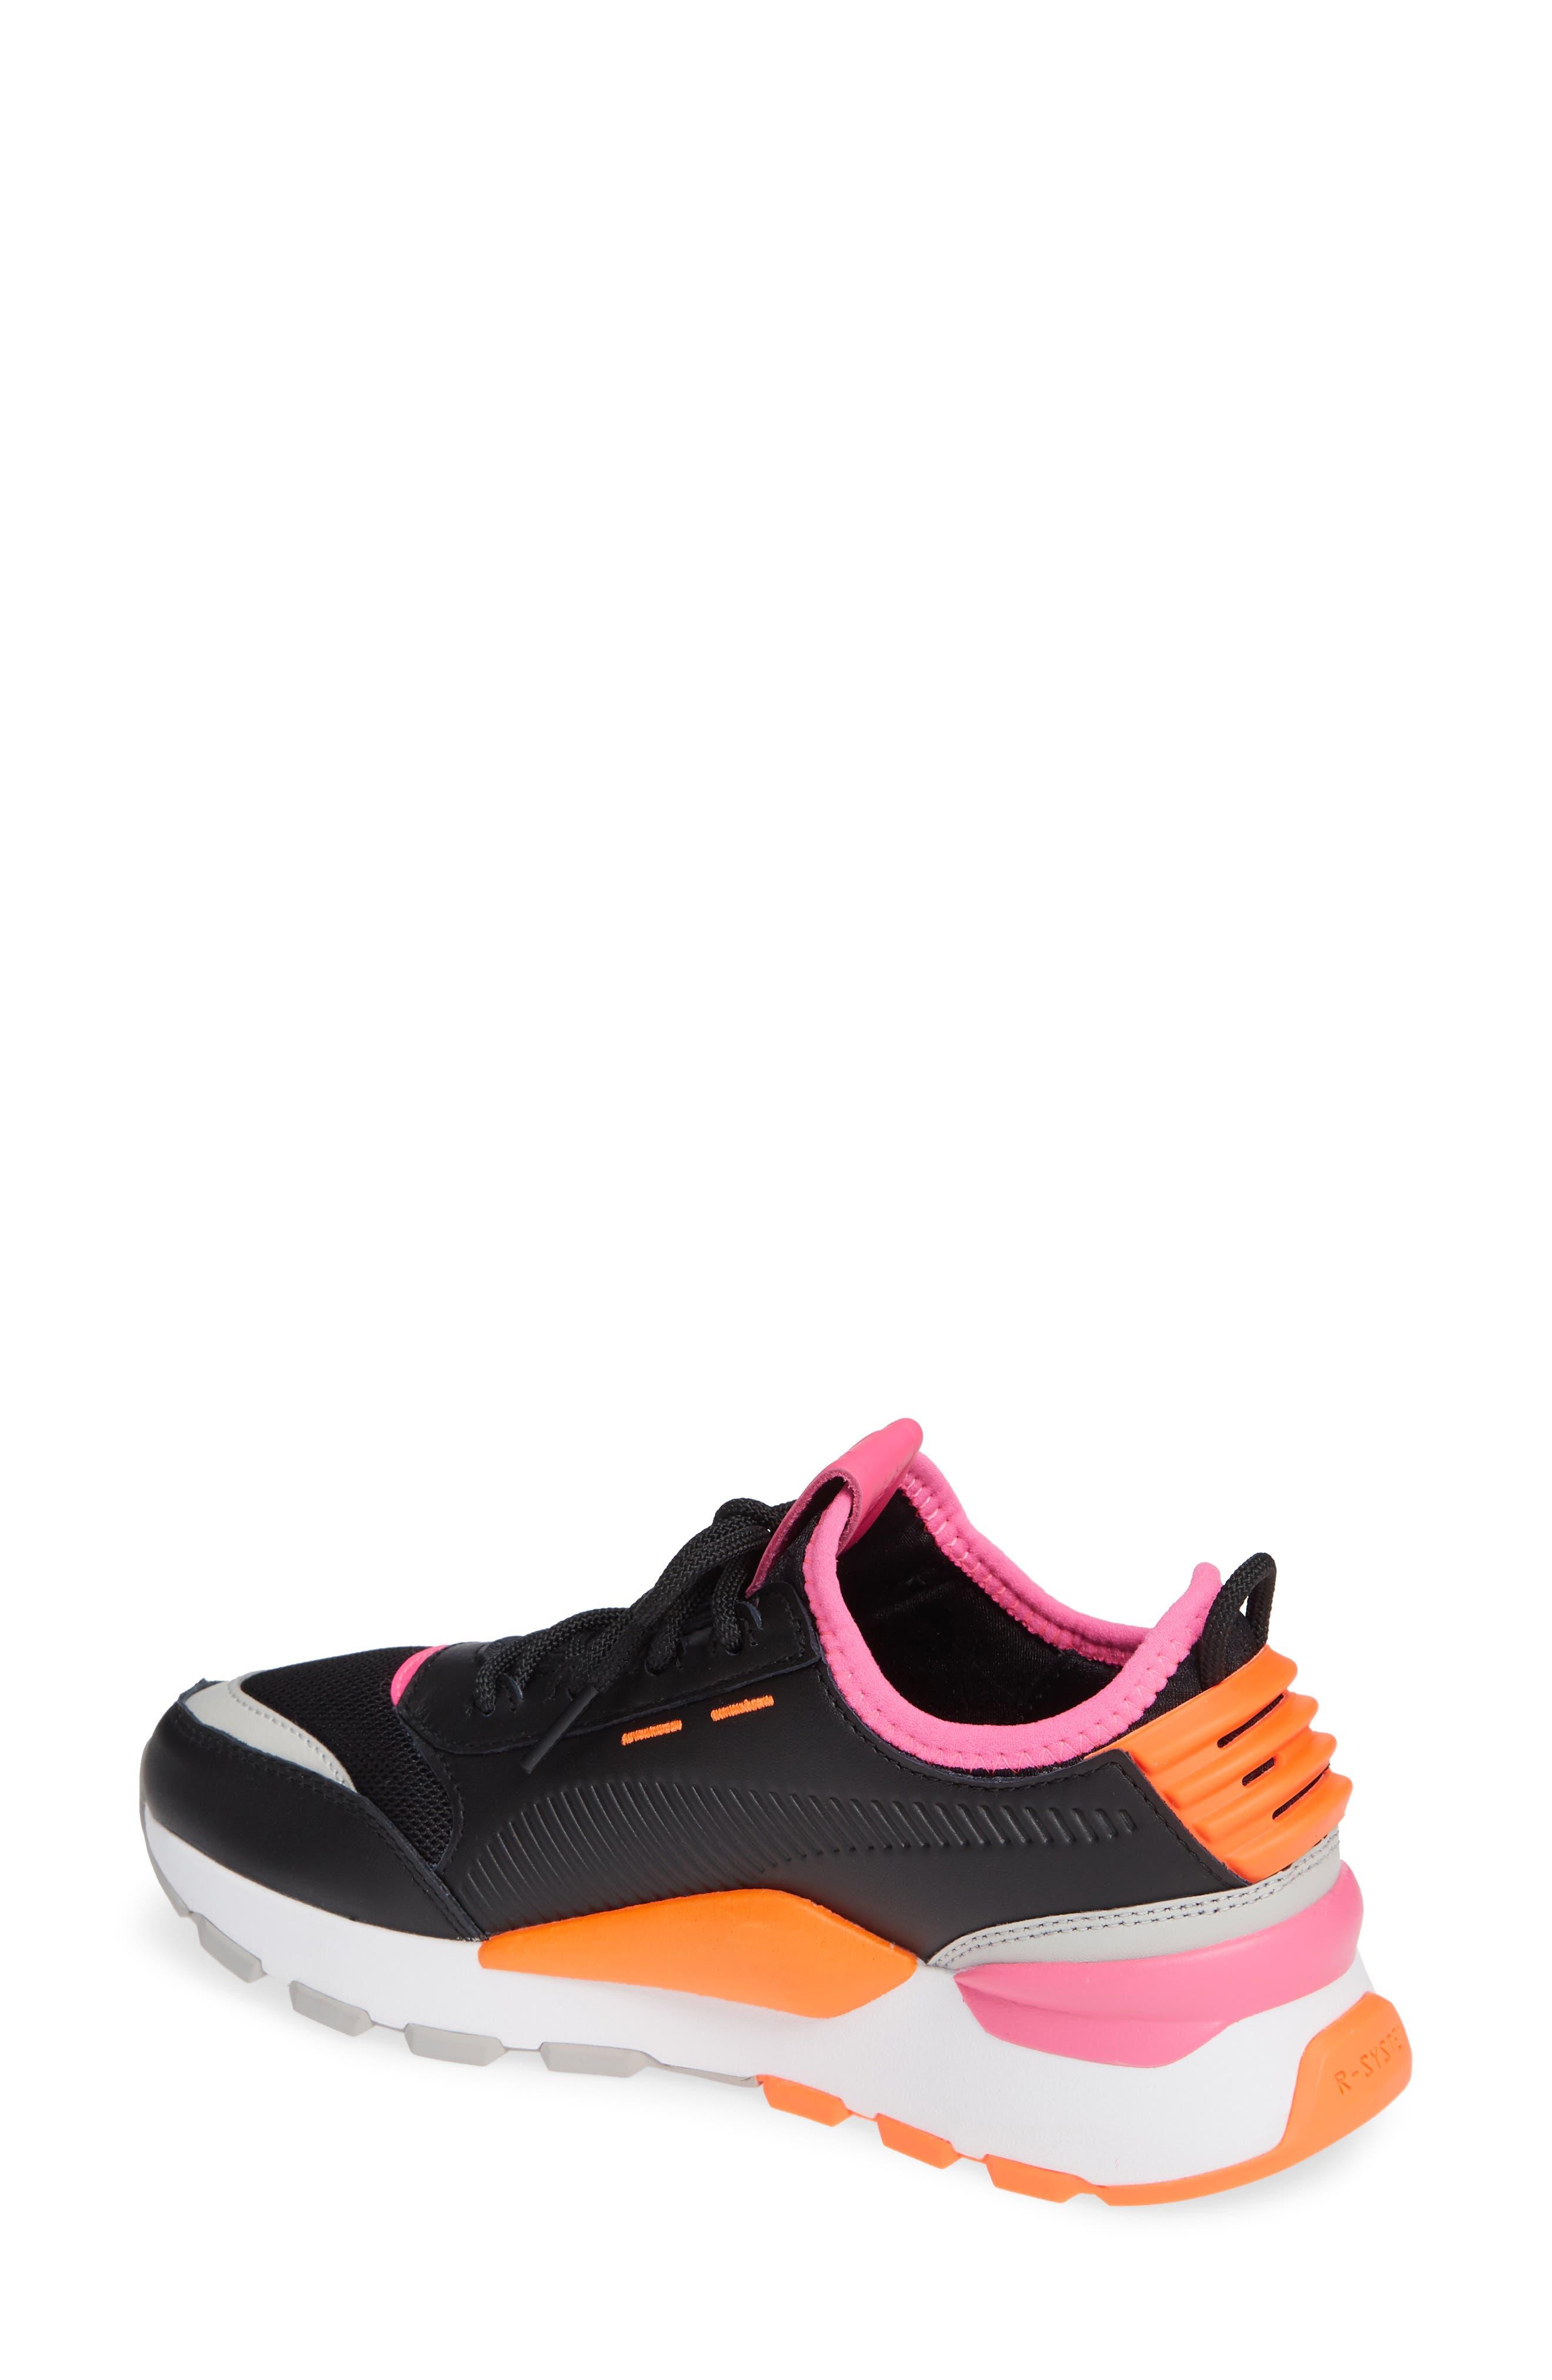 RS-0 Sneaker,                             Alternate thumbnail 2, color,                             001